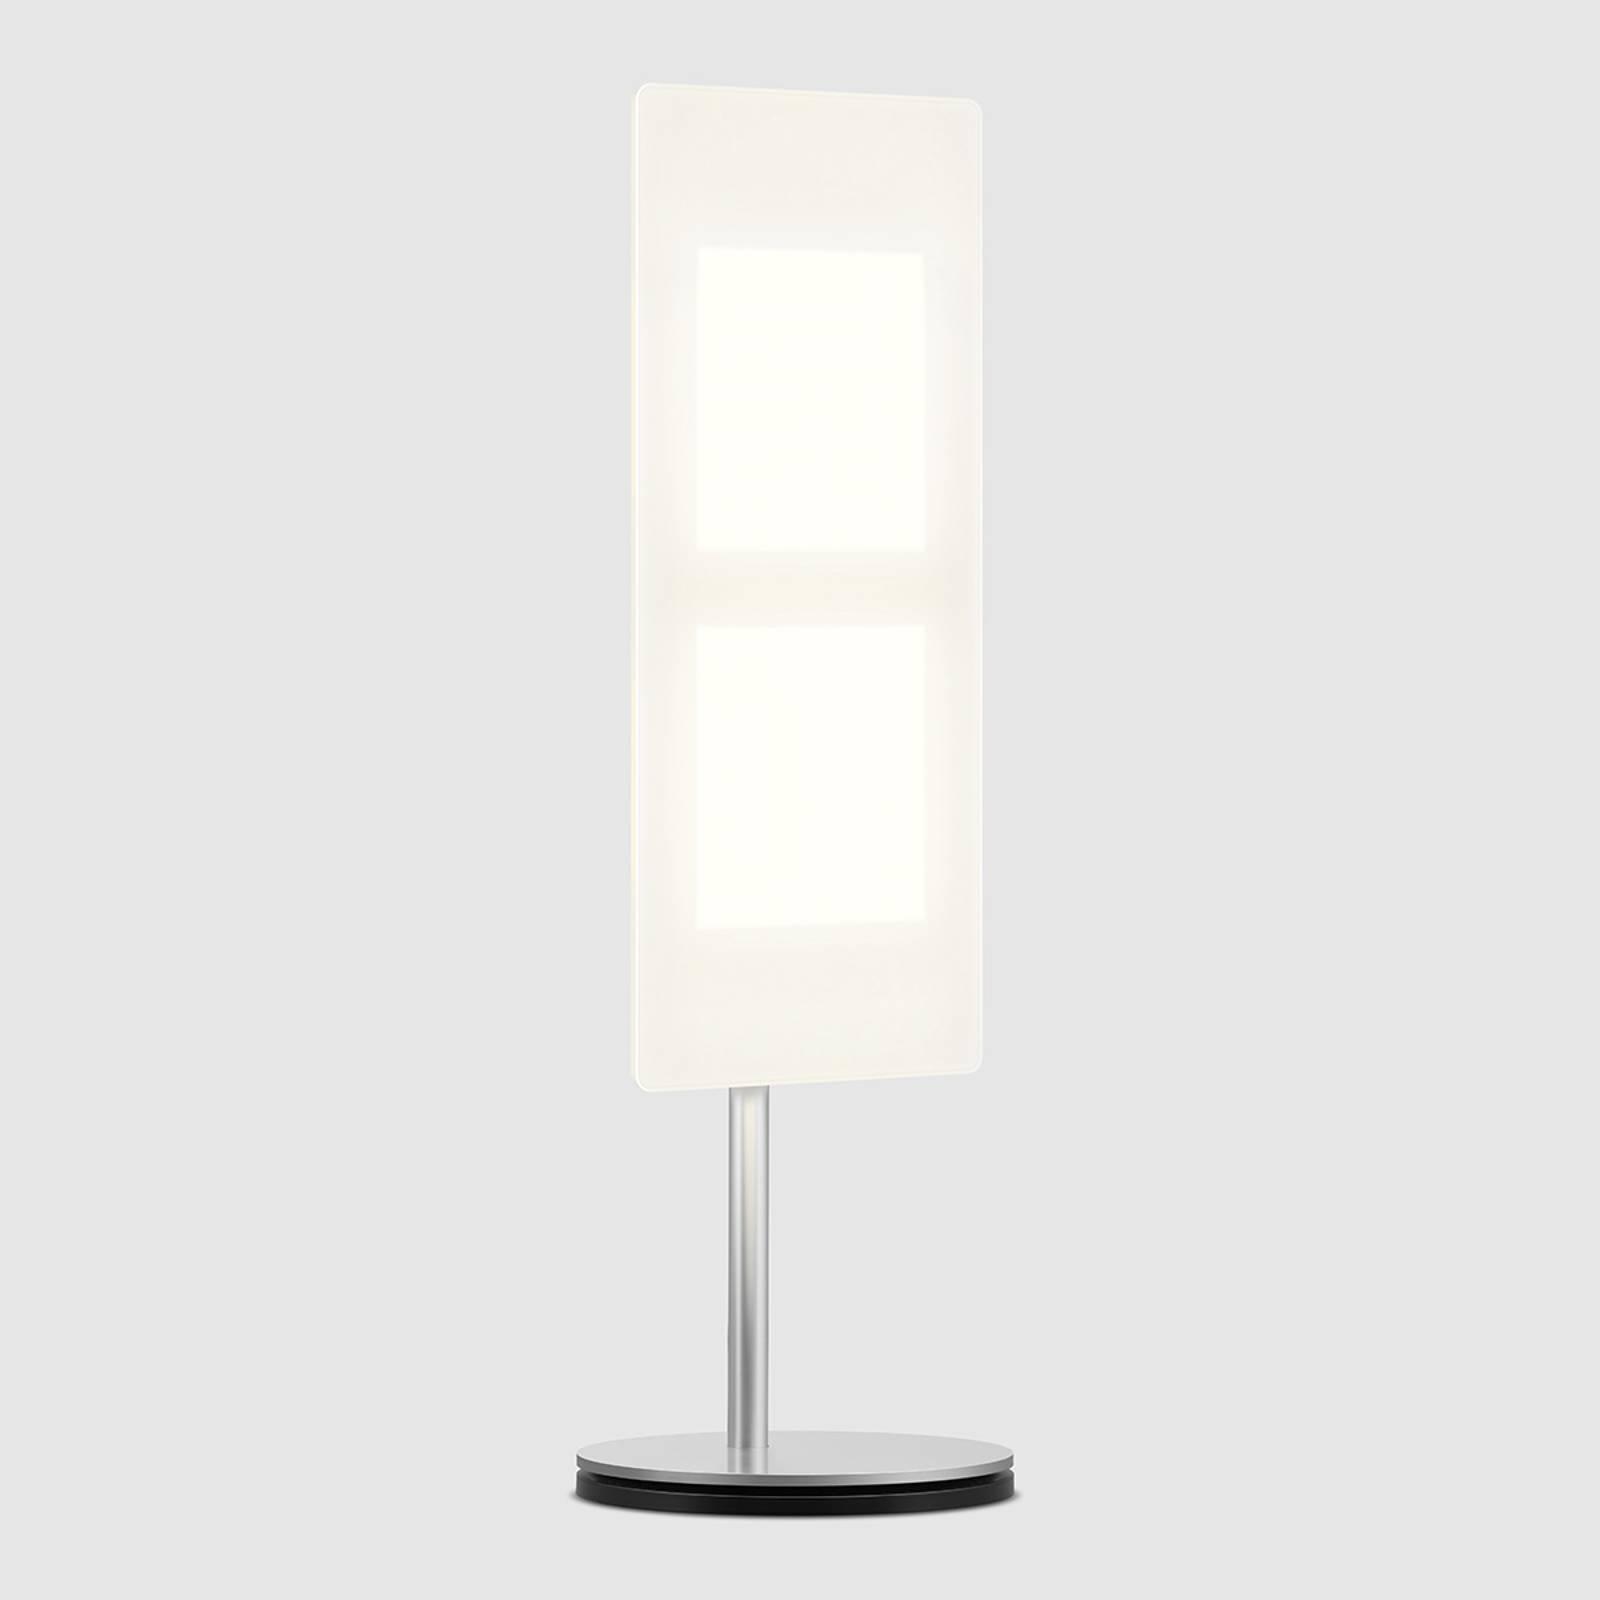 OLED-pöytävalo OMLED One t2, musta, 47,8 cm